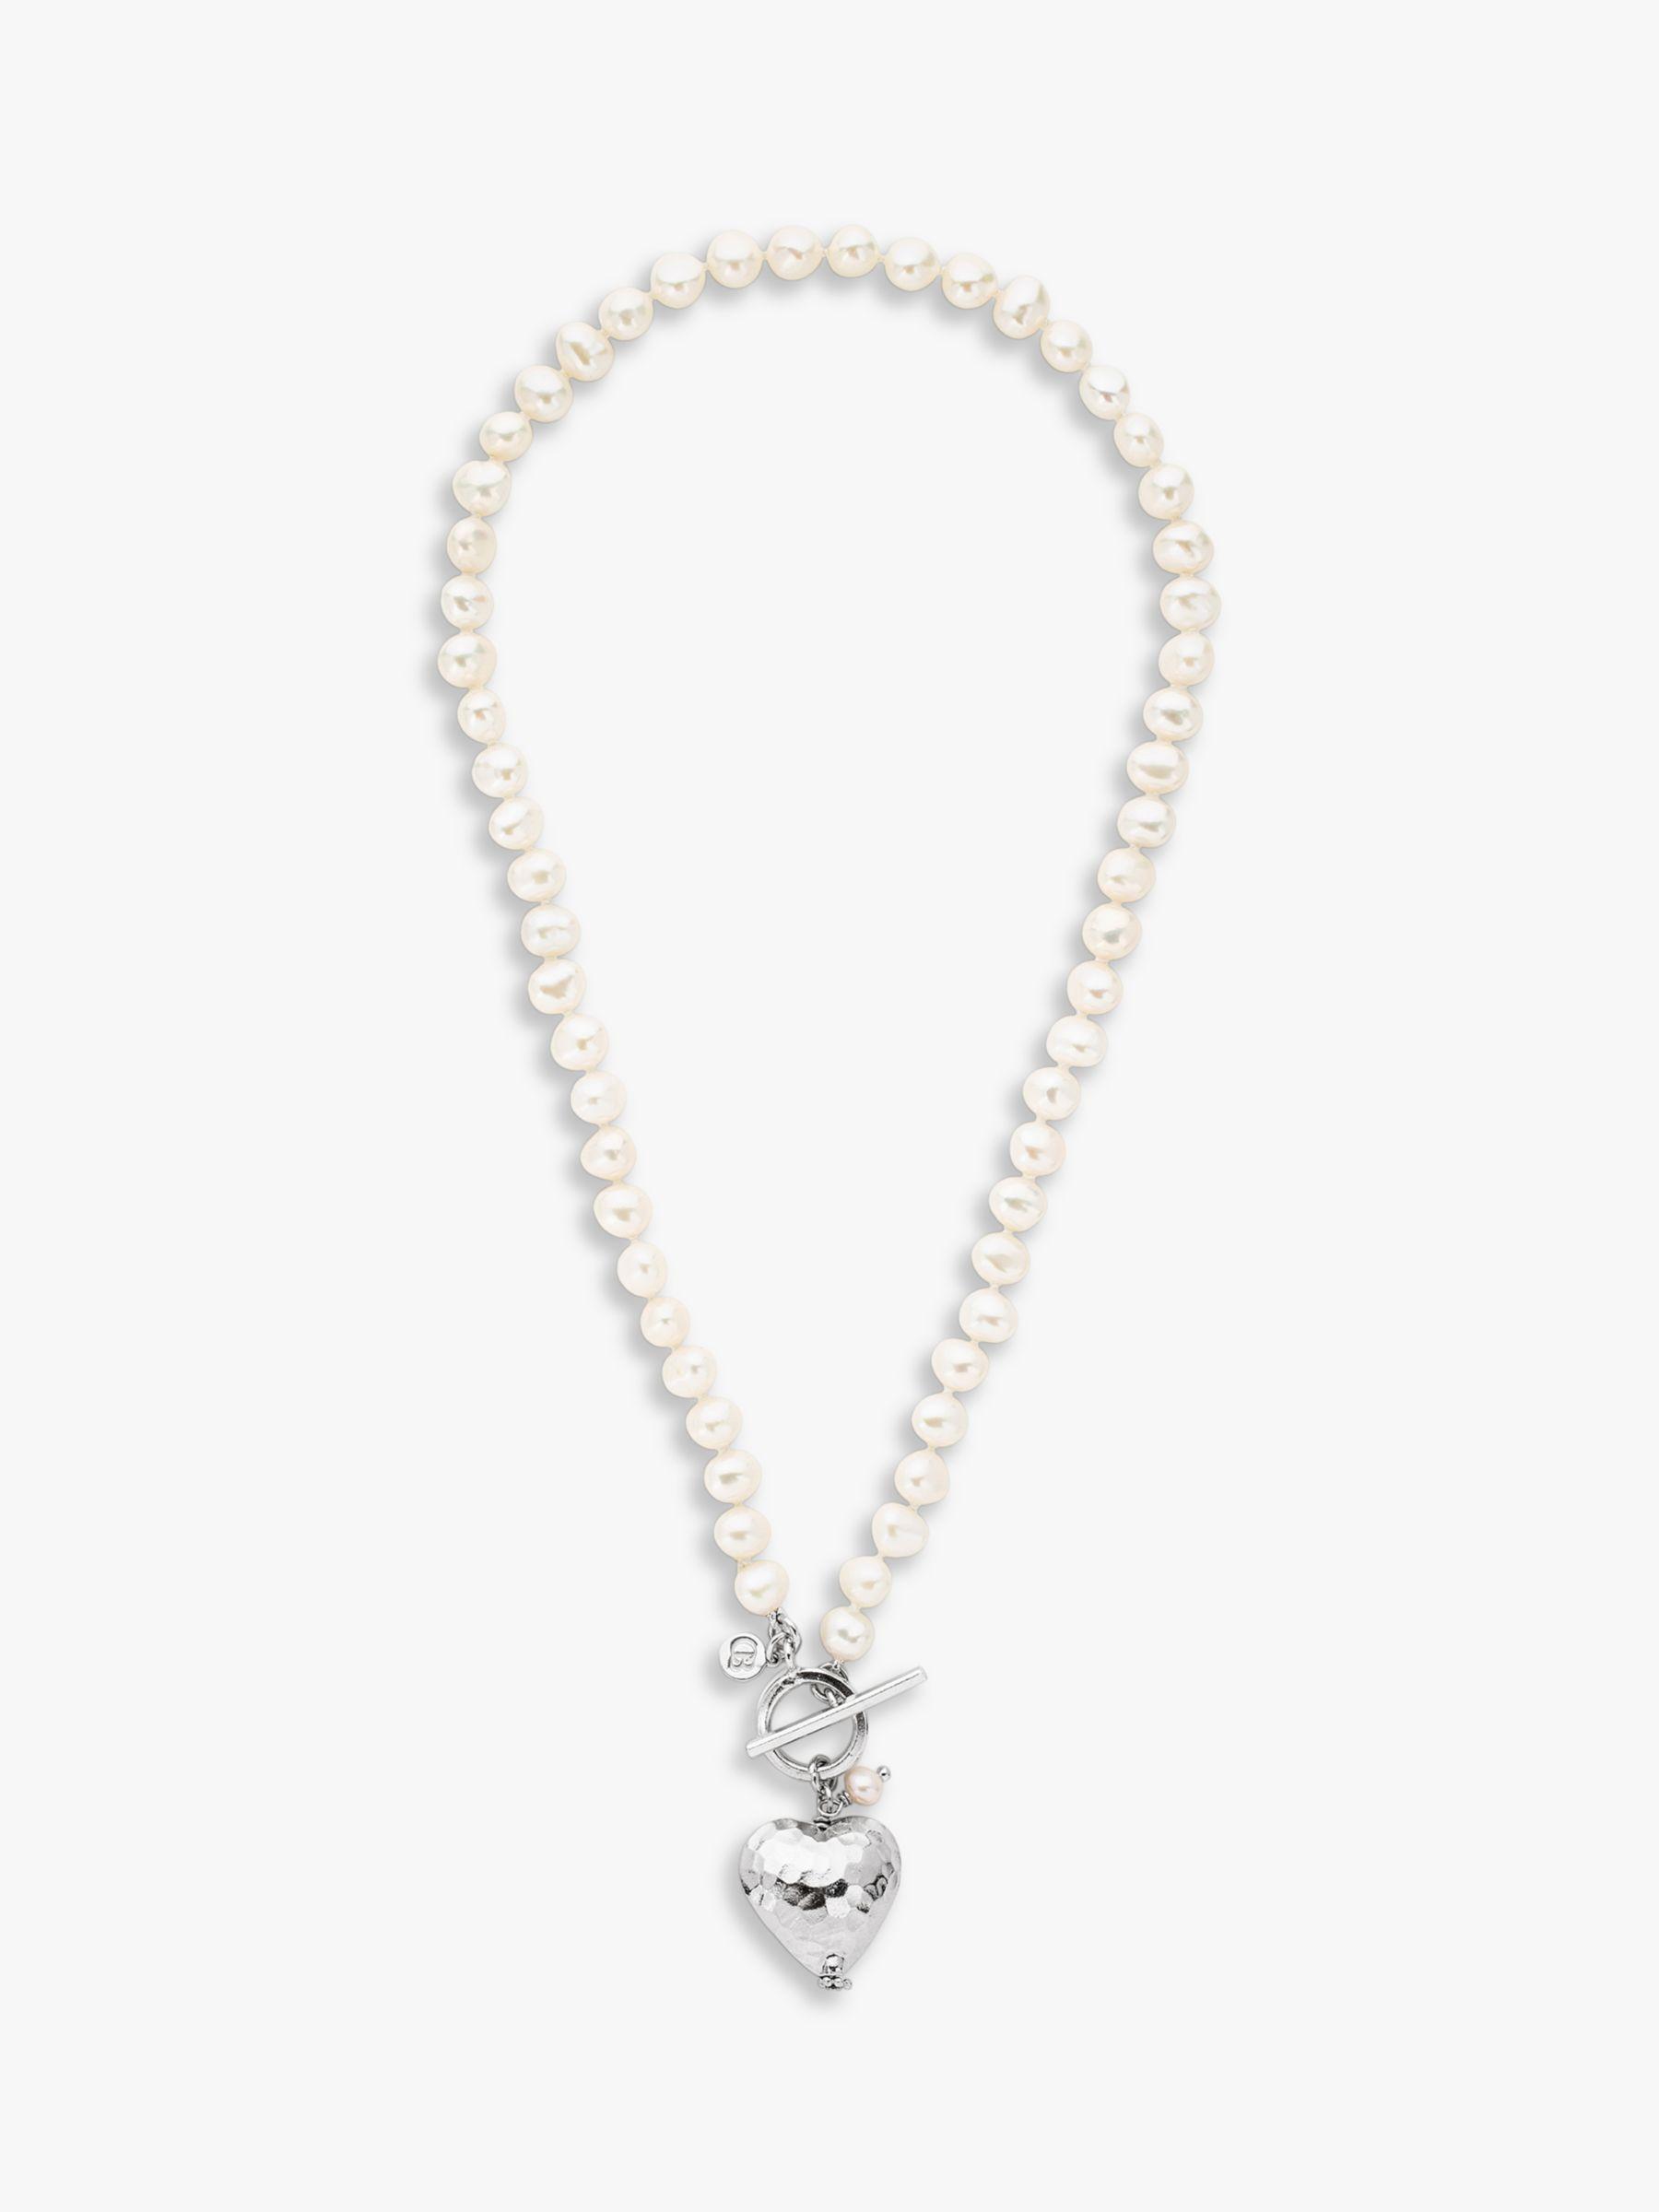 Claudia Bradby Claudia Bradby Bella Hammered Heart Pendant Necklace